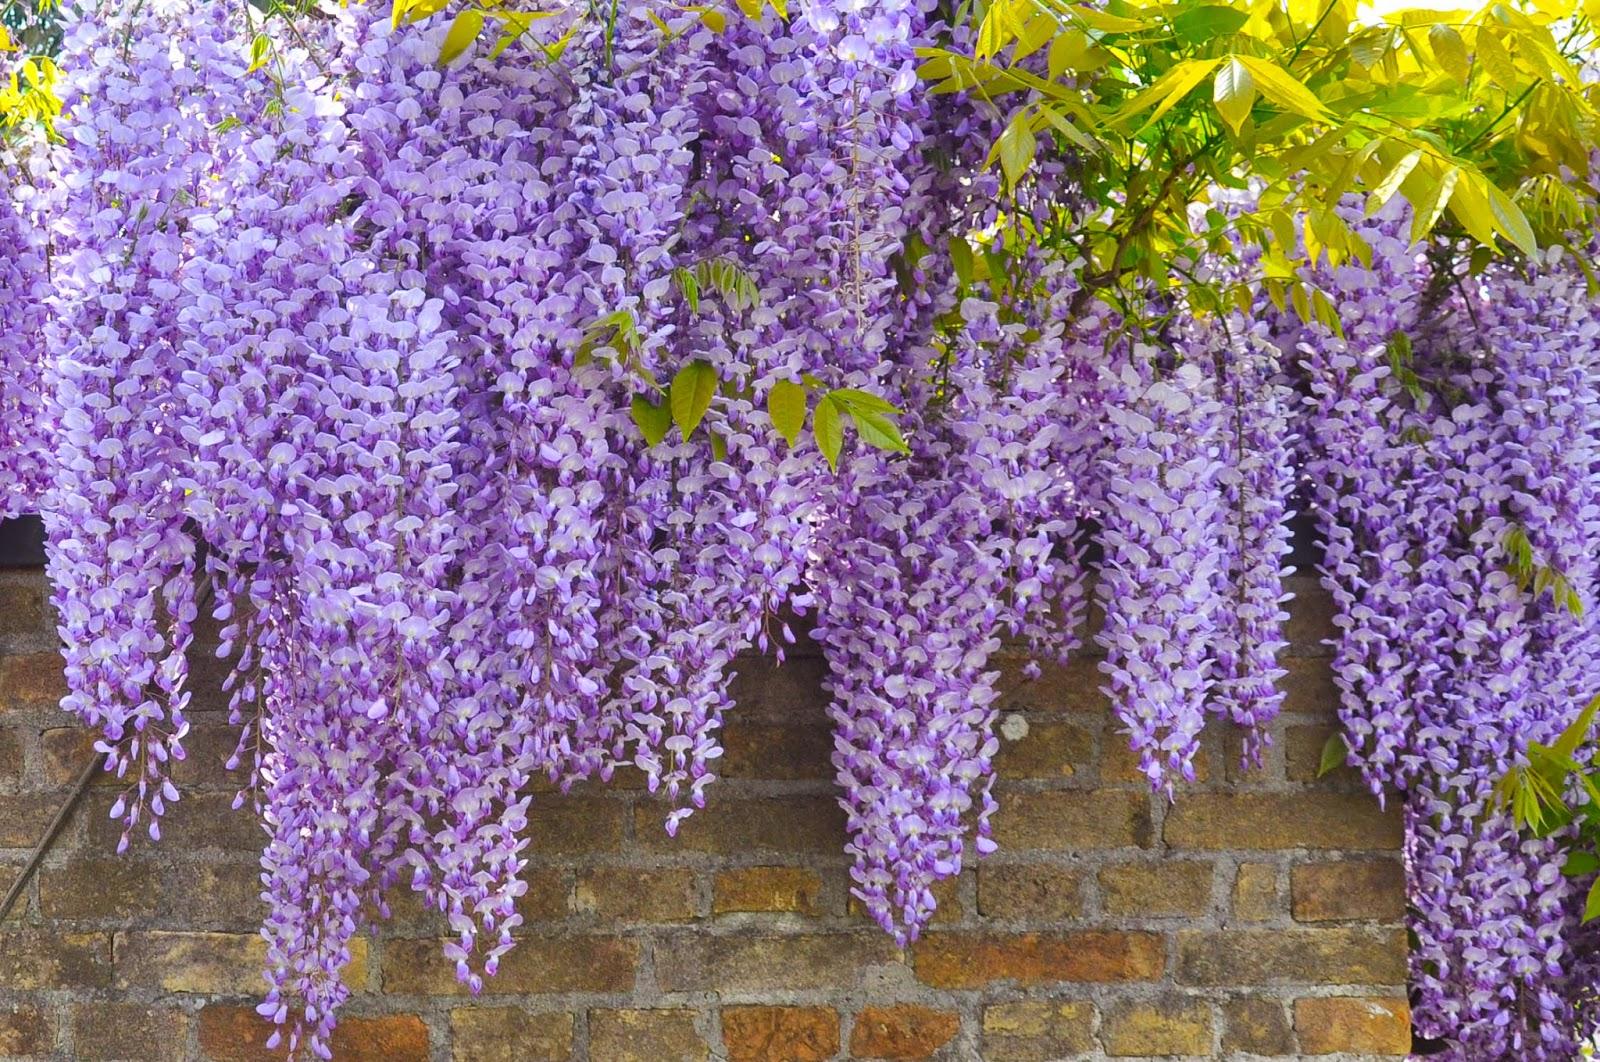 Flowering wisteria, Wisteria in full bloom